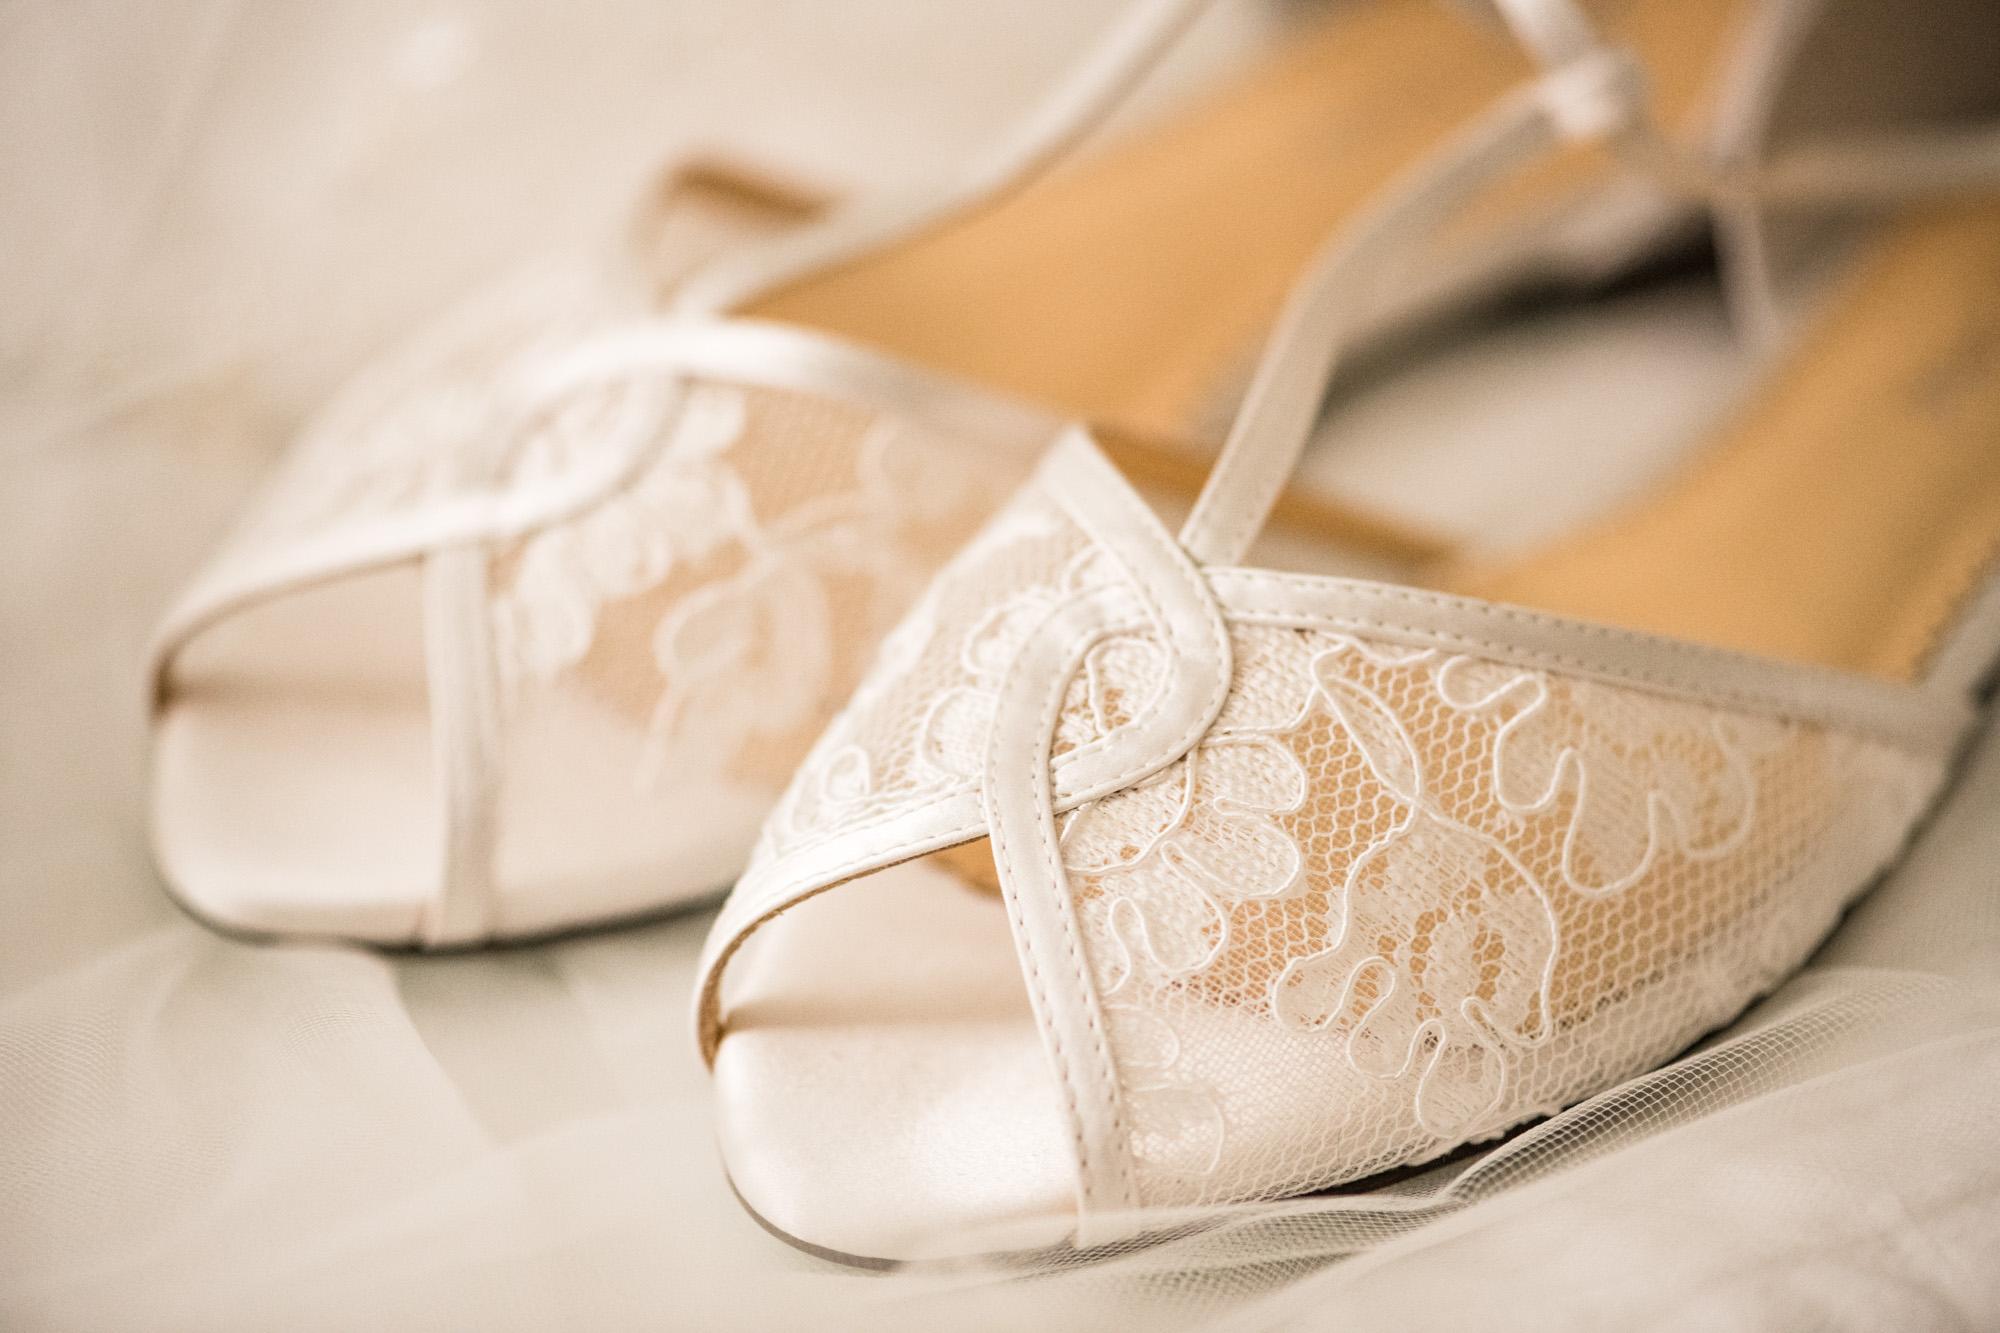 nj-wedding-photographer-maritime-parc-maria-david-3.jpg